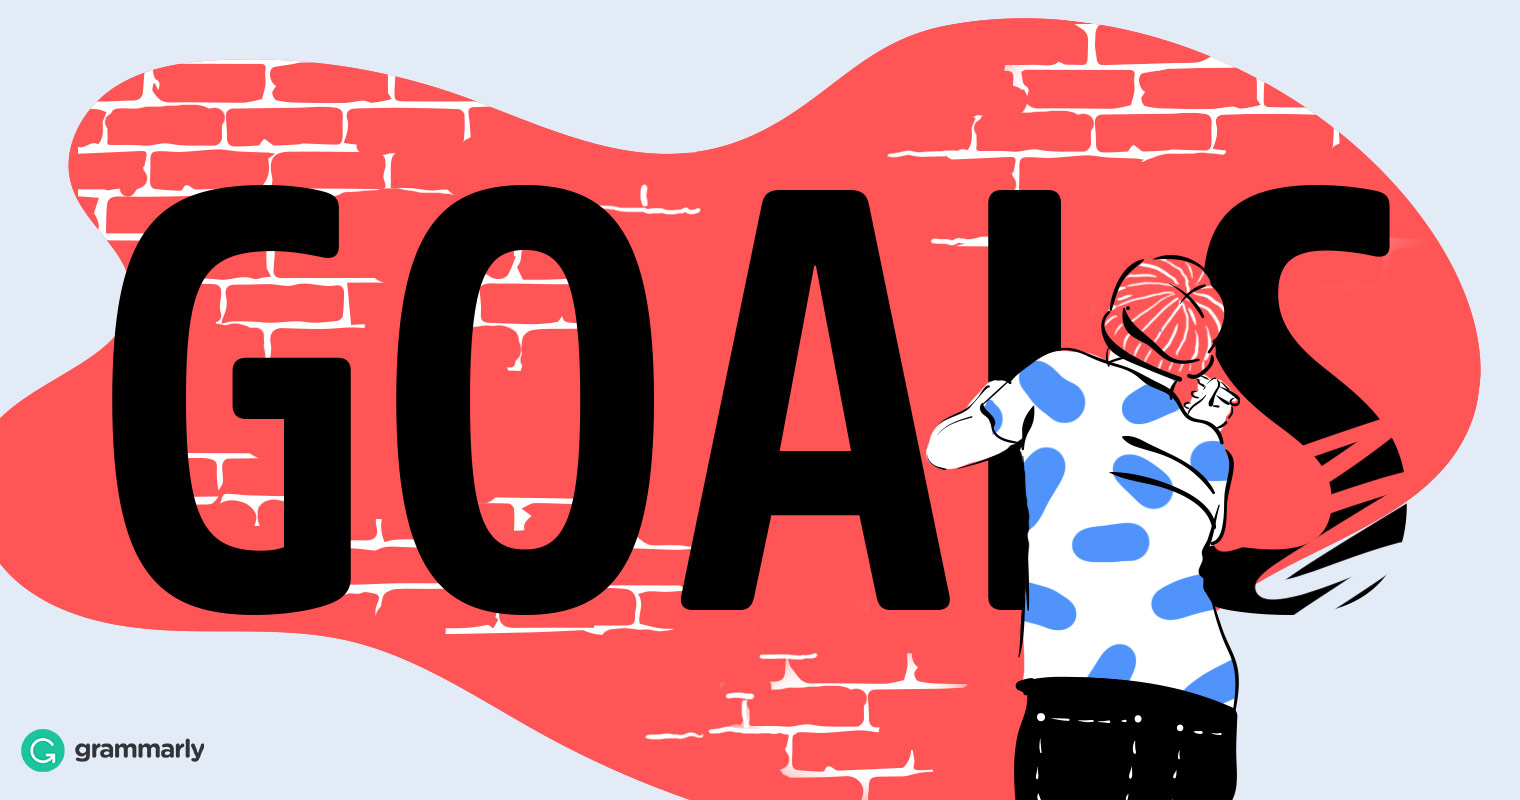 Goal clipart goal met.  words you should